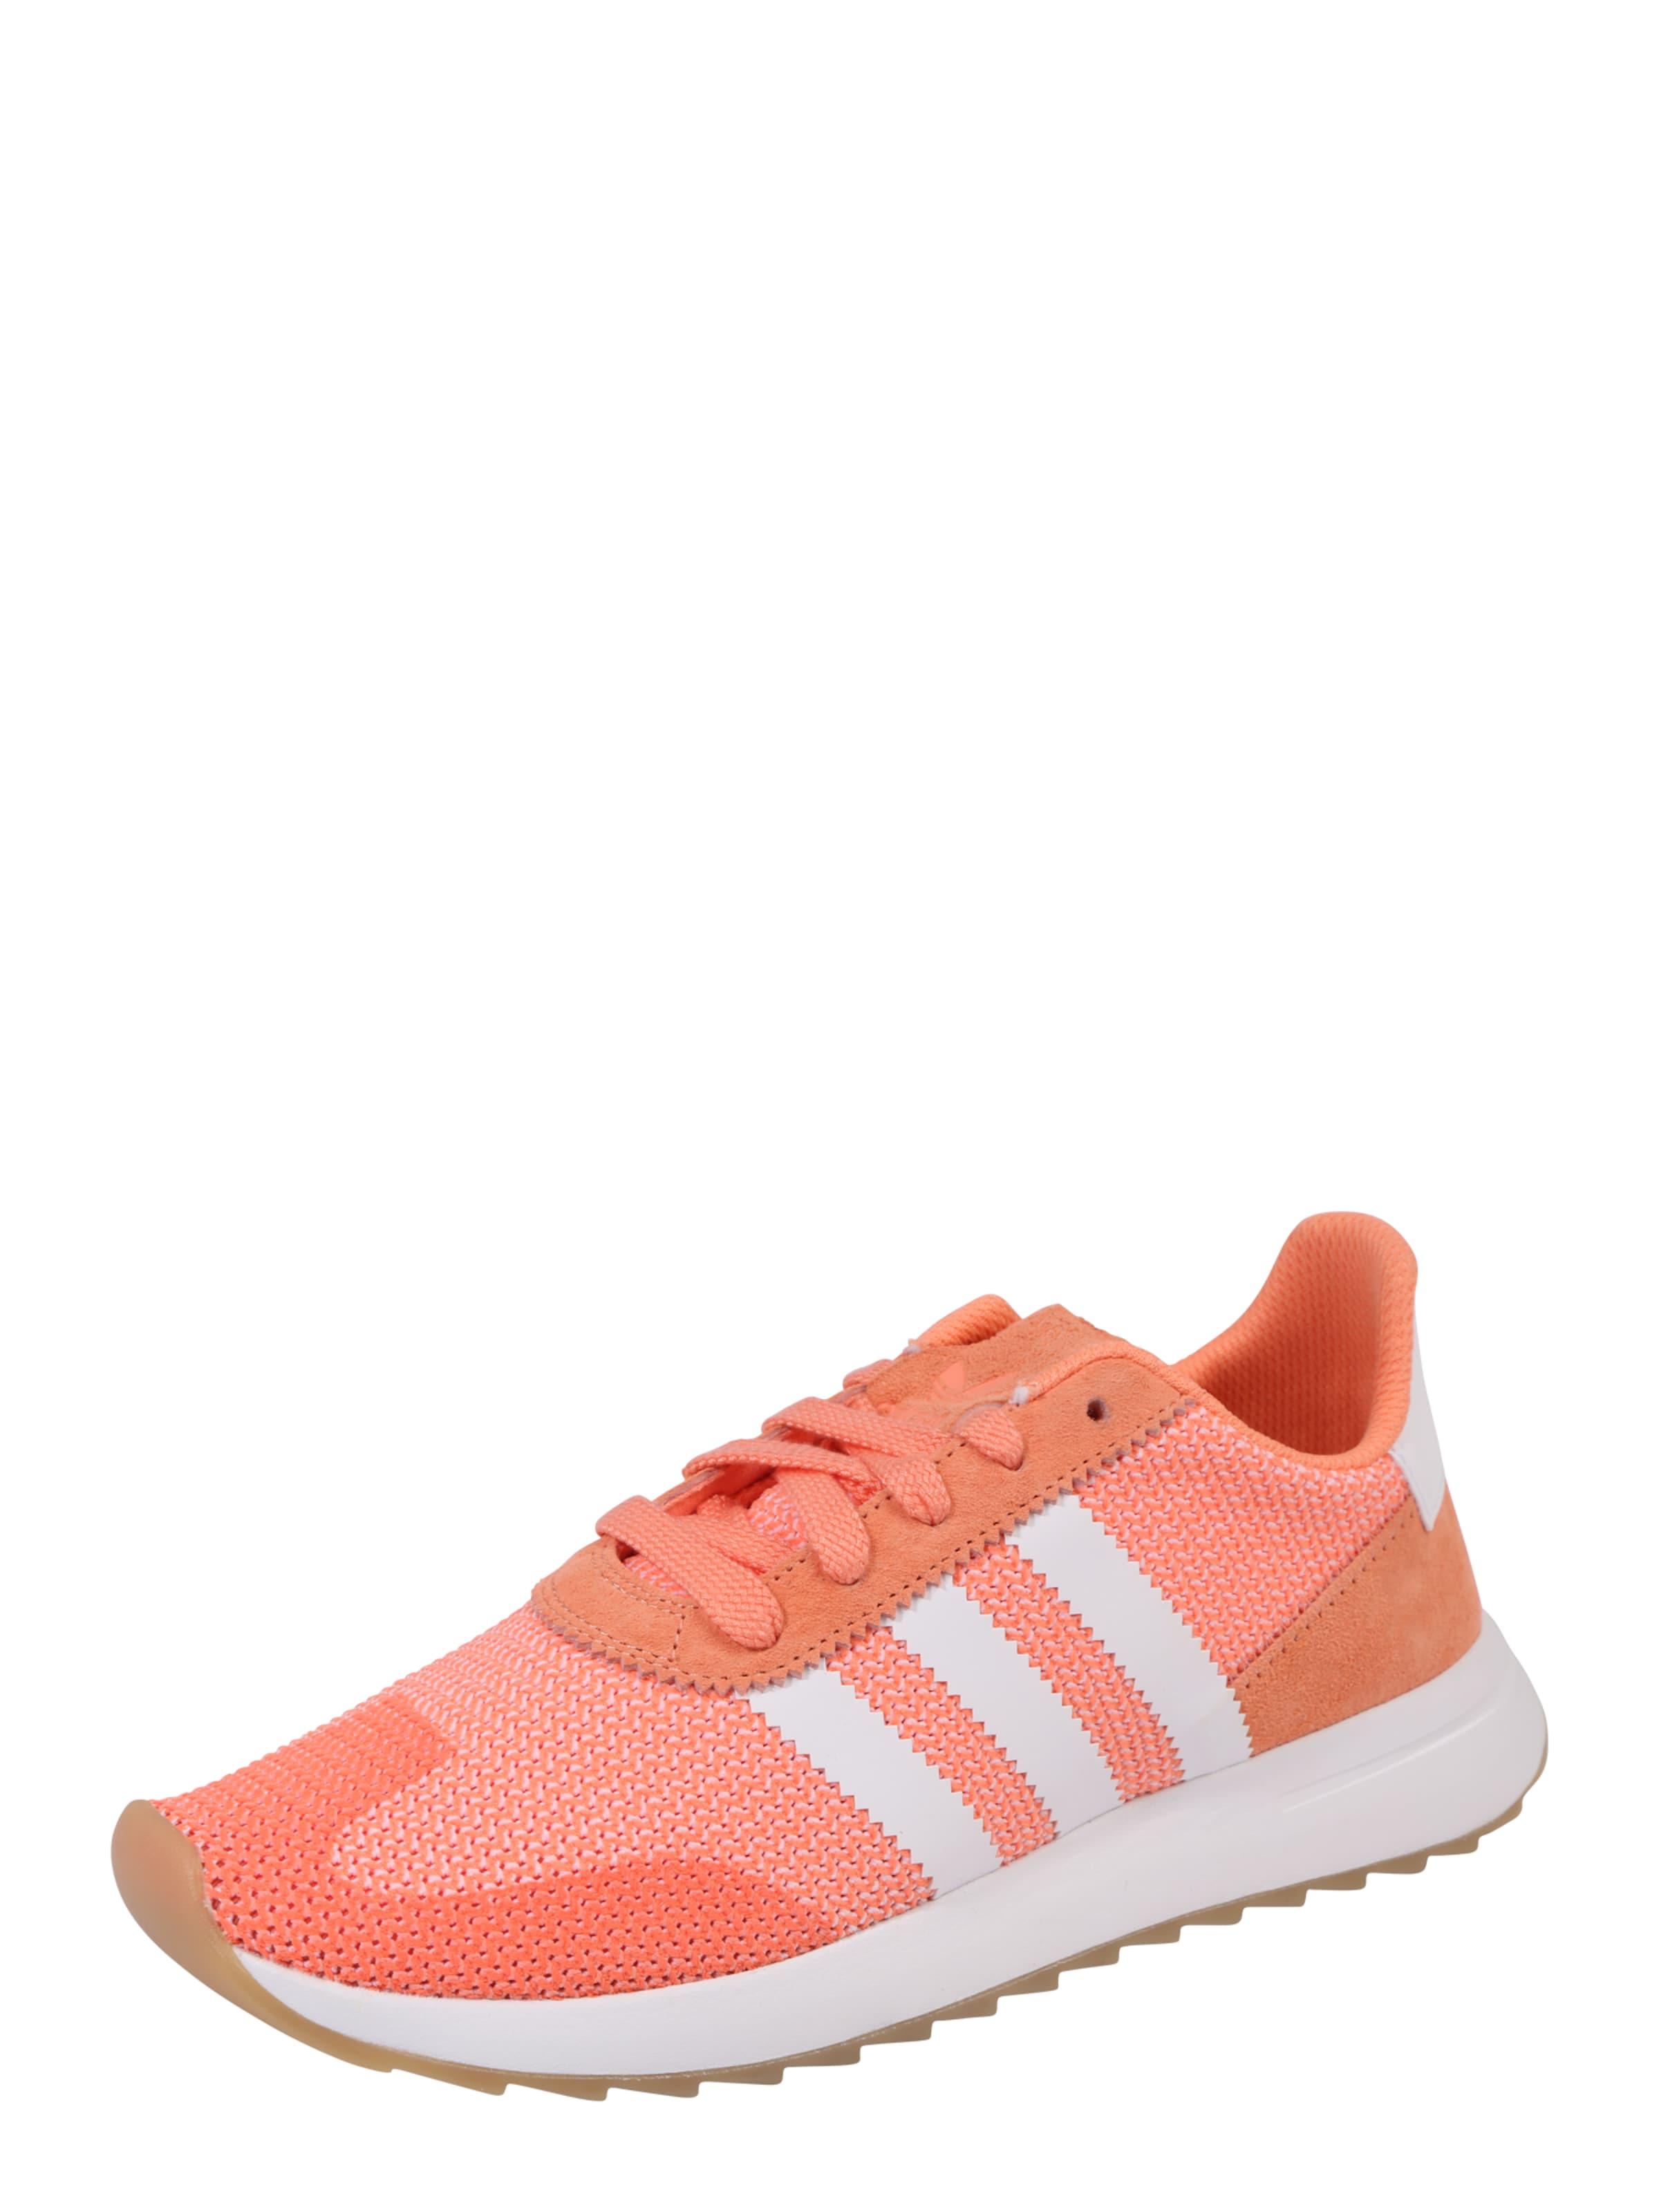 Adidas Originals Sneakers Corail Bas 'runner' jQmArMJZiY